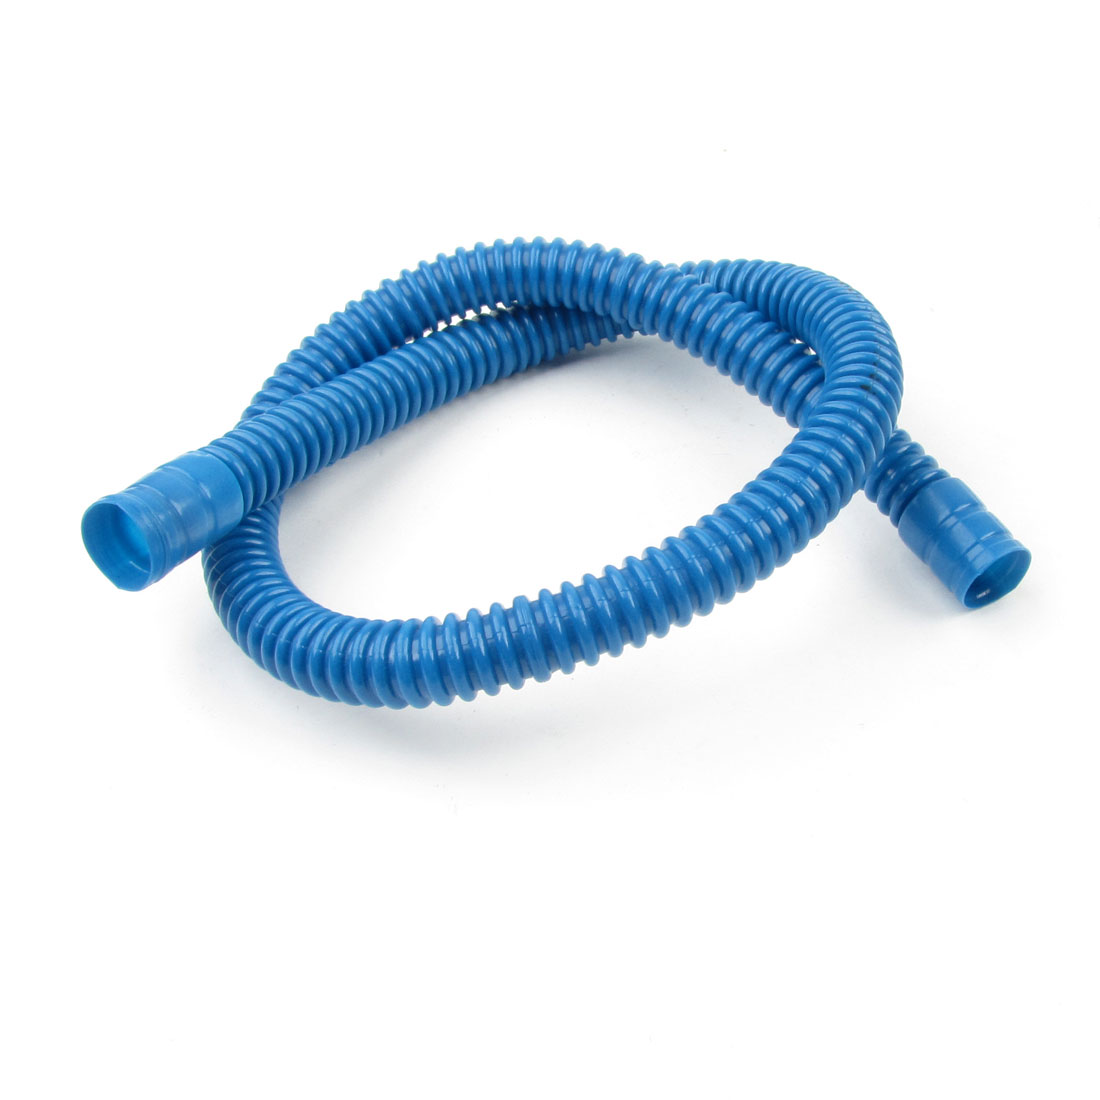 washer machine drain hose